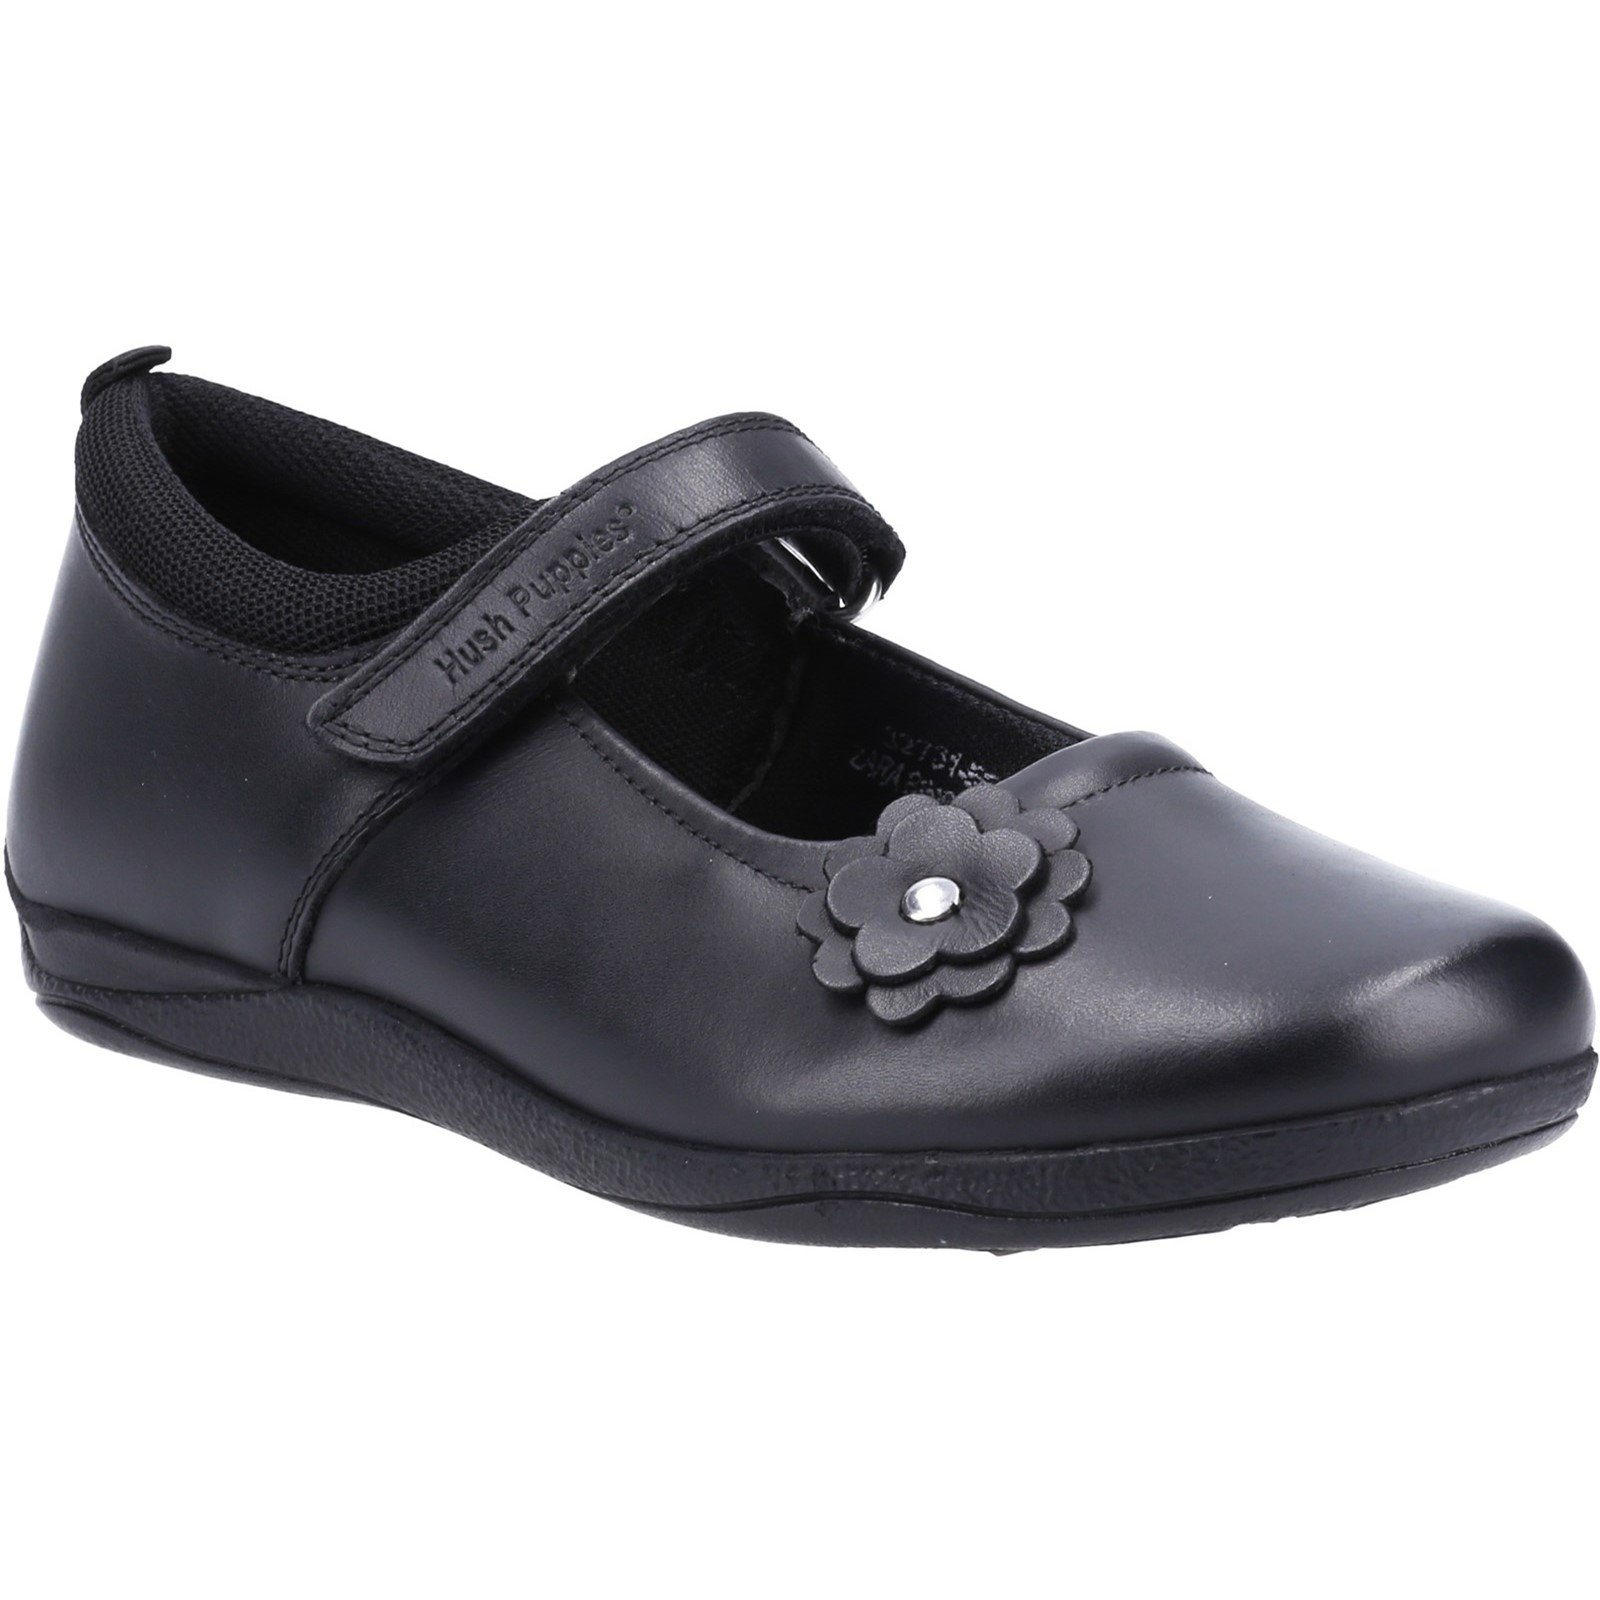 Hush Puppies Kid's Zara Junior School Flat Shoe Black 32731 - Black 10